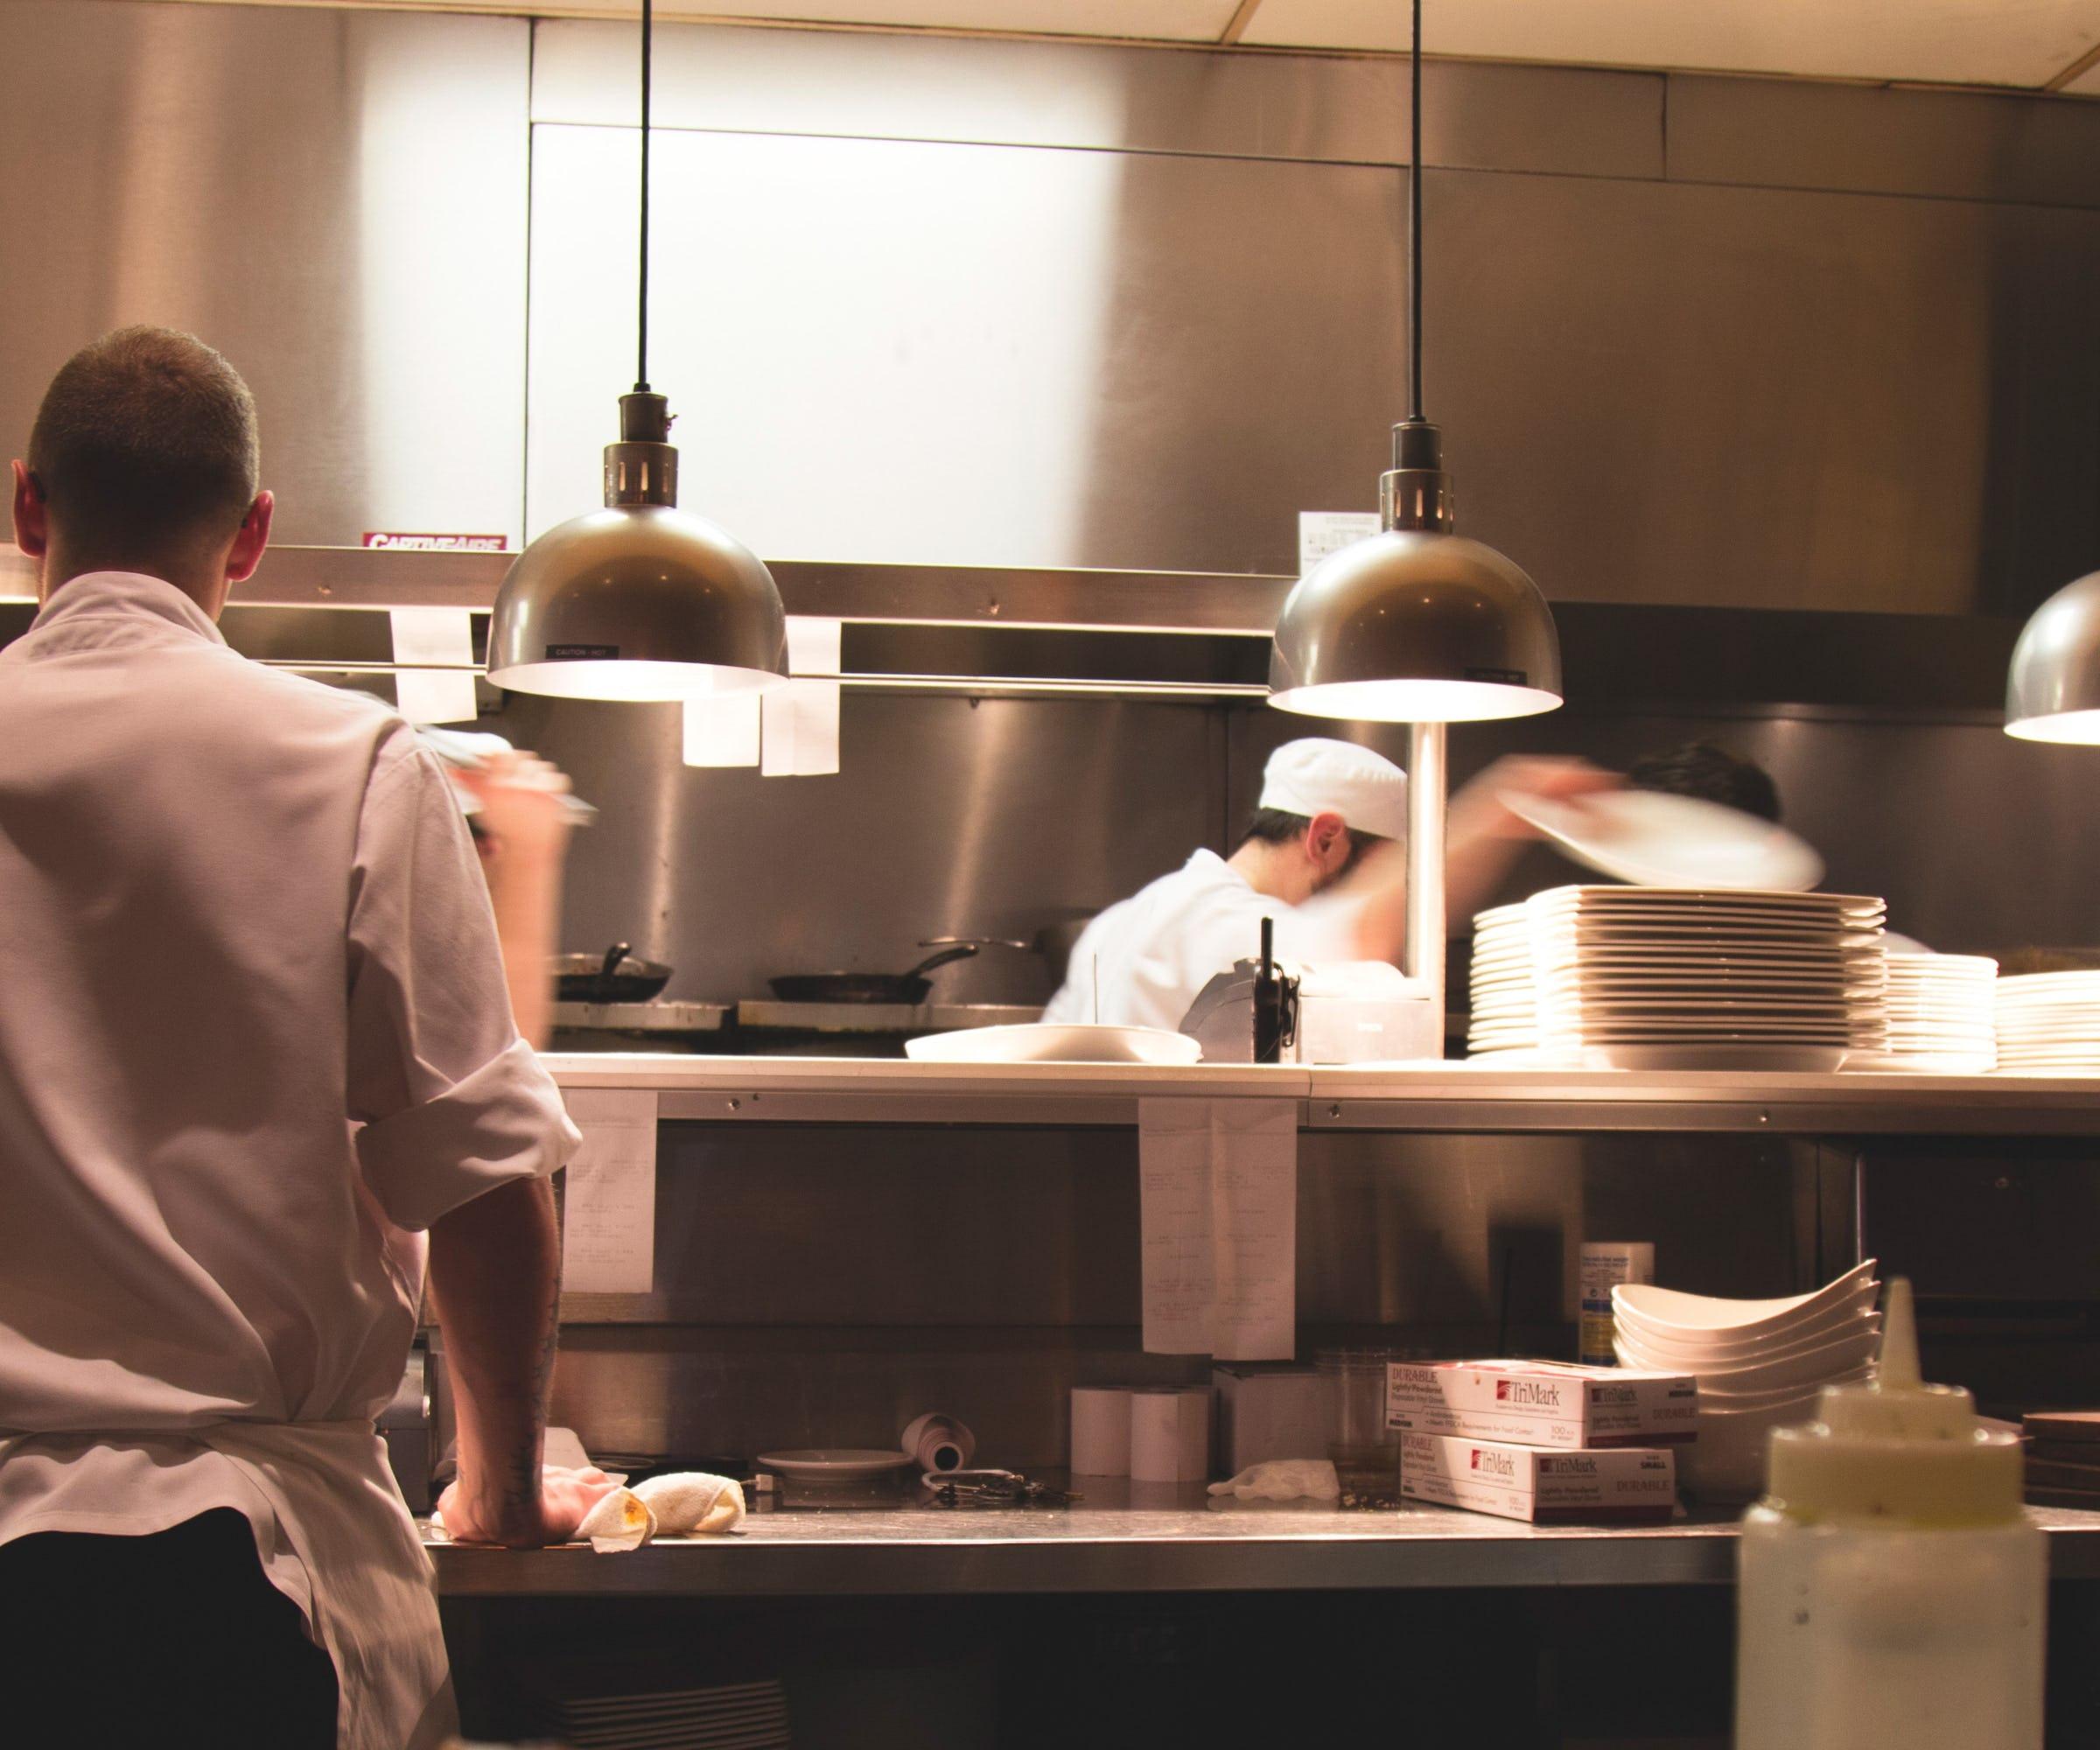 Food Service Management Businesses